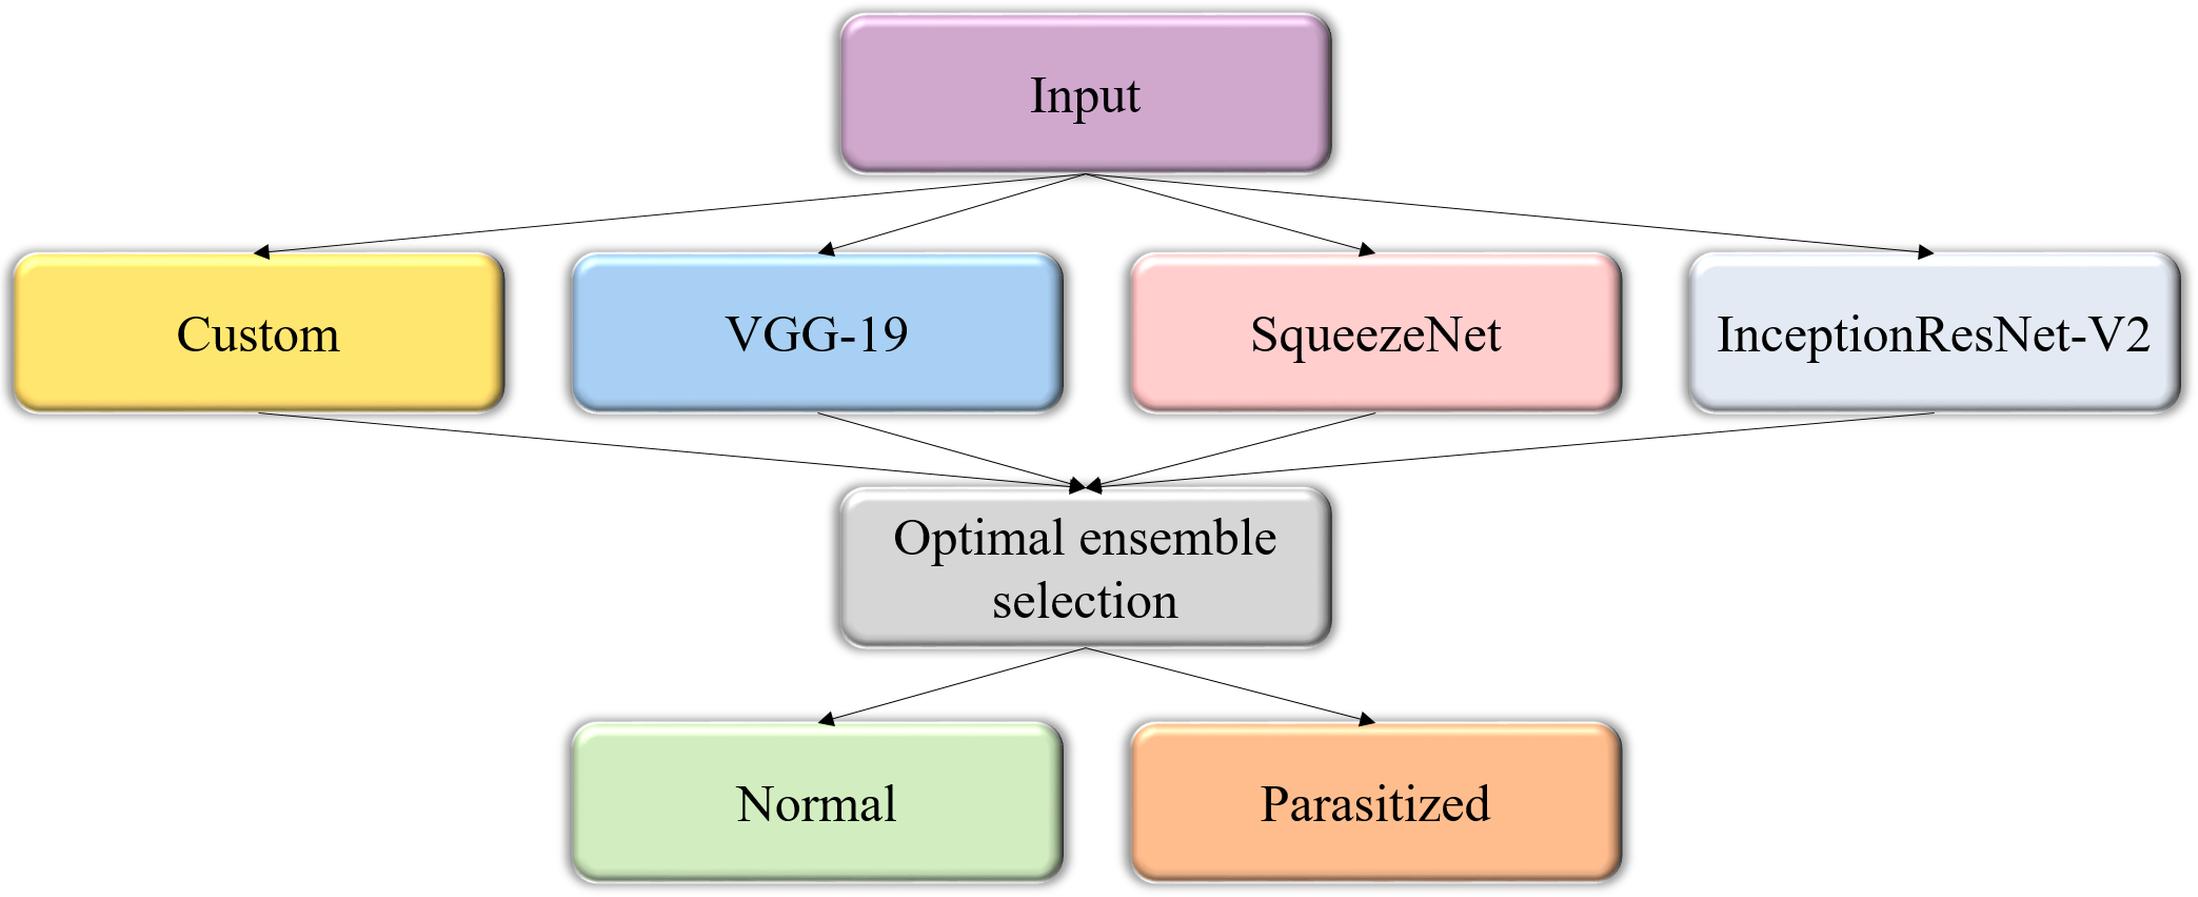 Performance evaluation of deep neural ensembles toward malaria